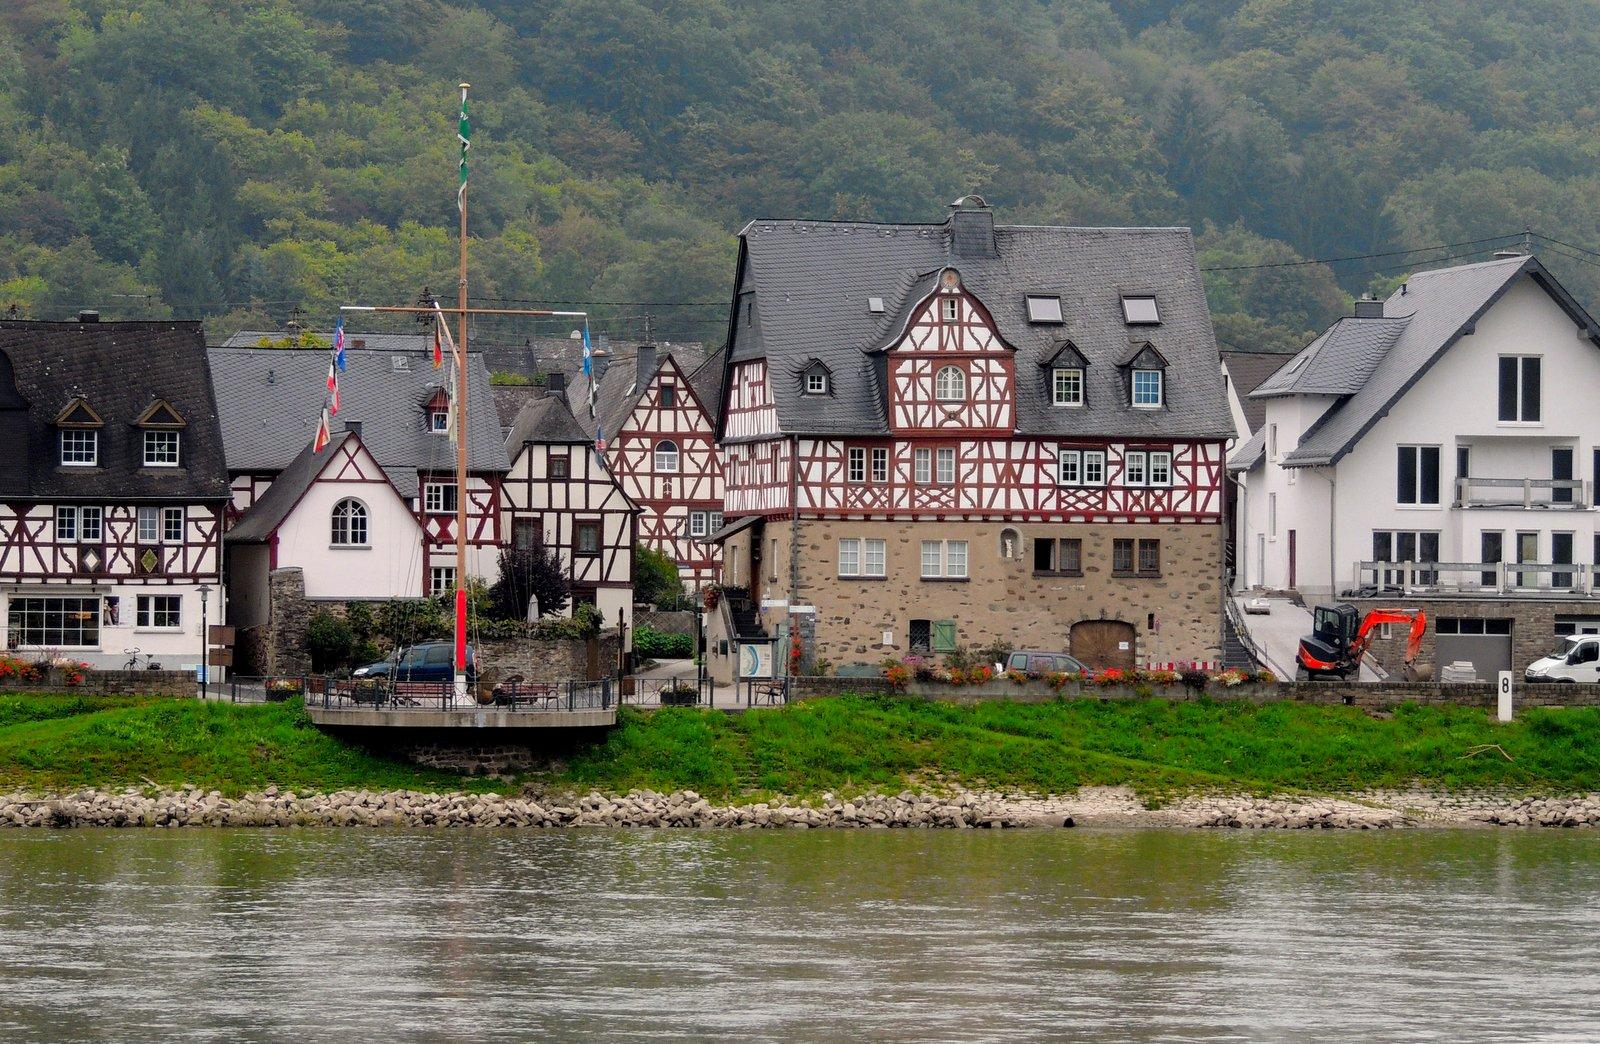 Spay am Rhein